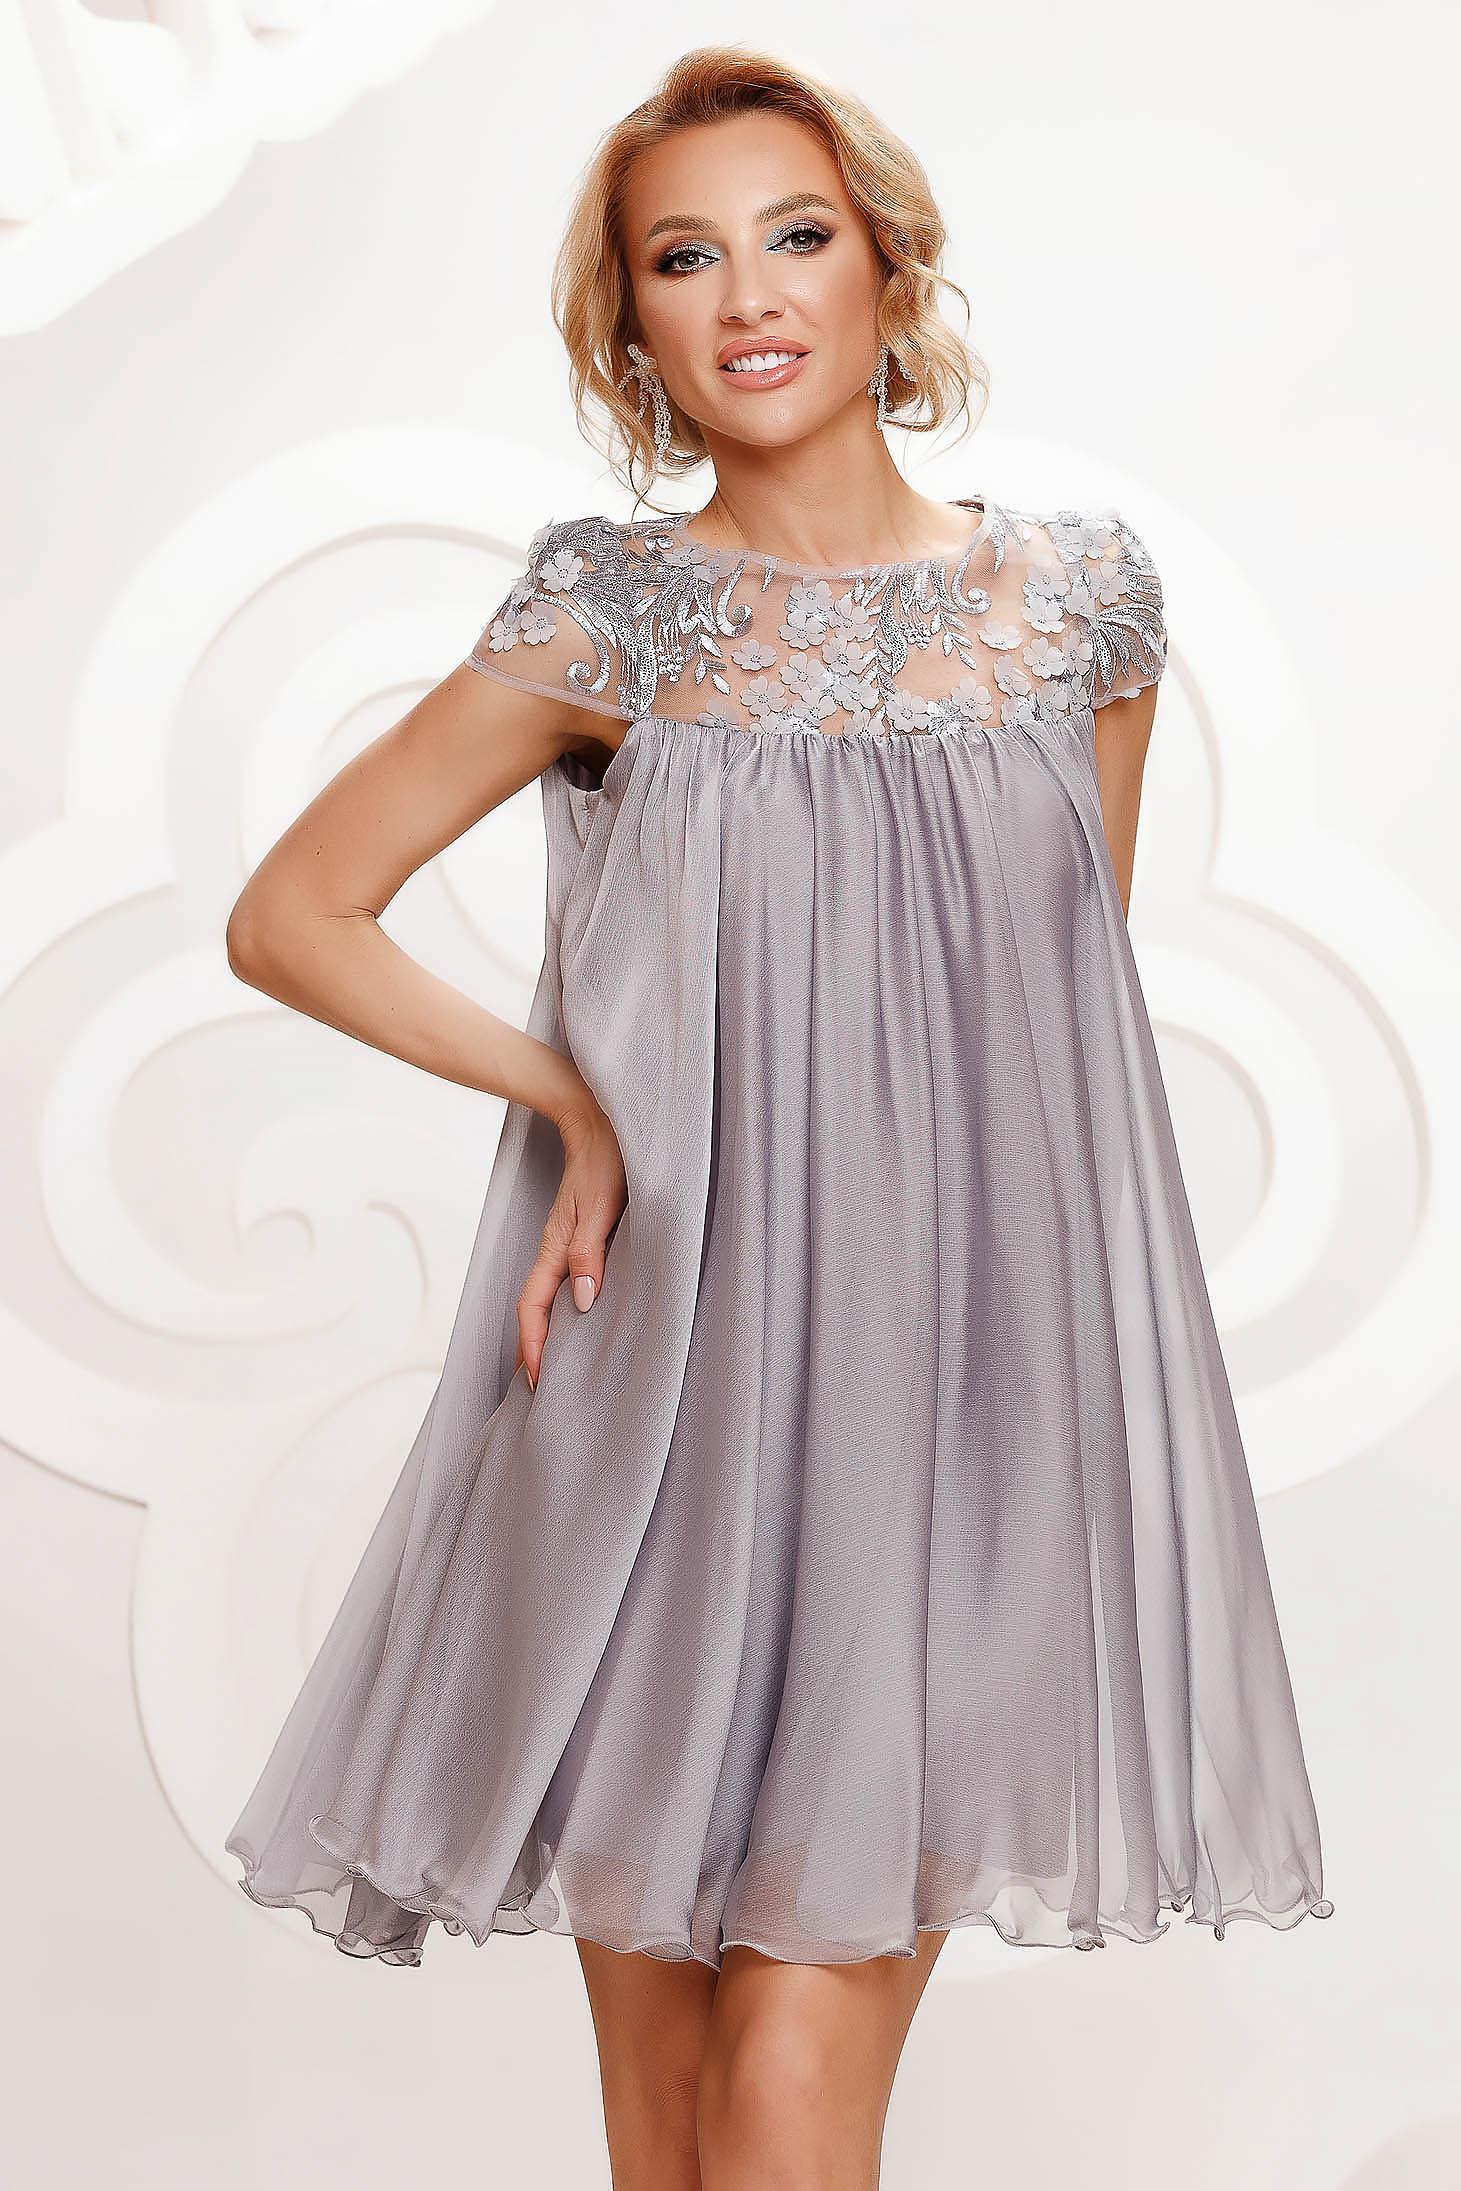 Silver dress occasional short cut slightly transparent fabric